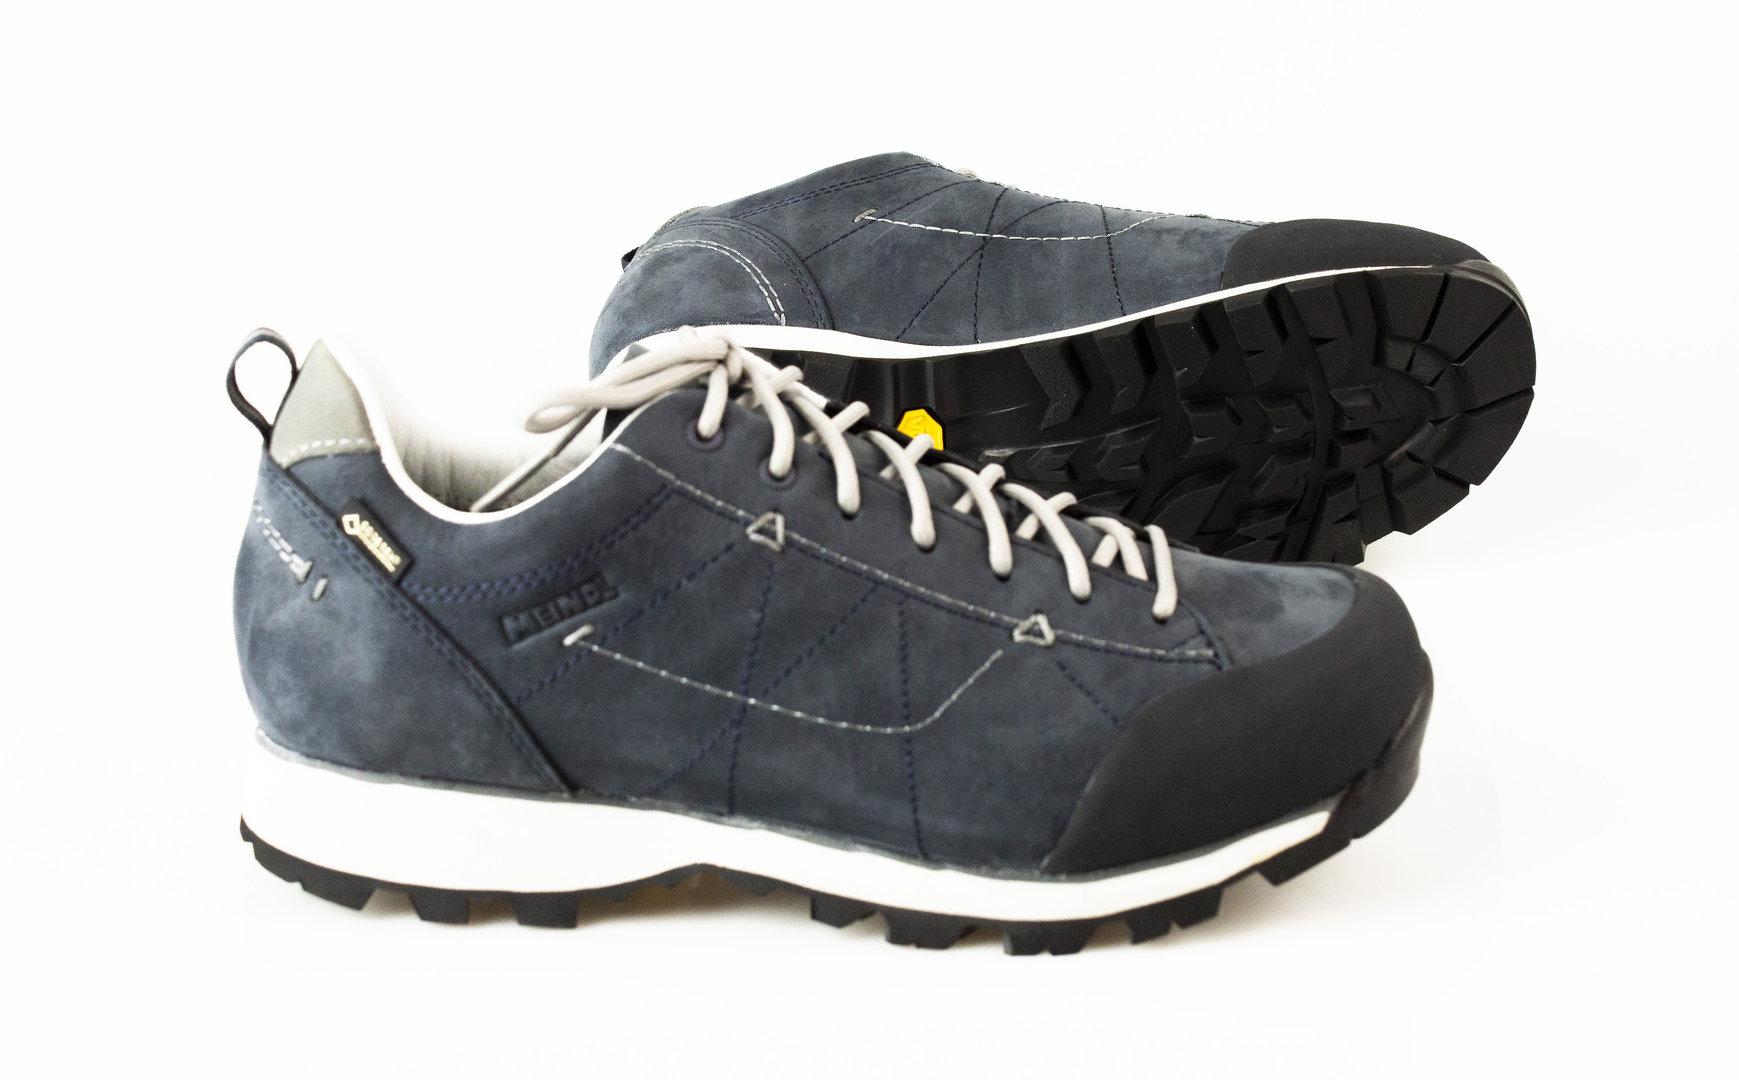 Meindl 4625 49 RIALTO LADY GTX laced shoes WP marine